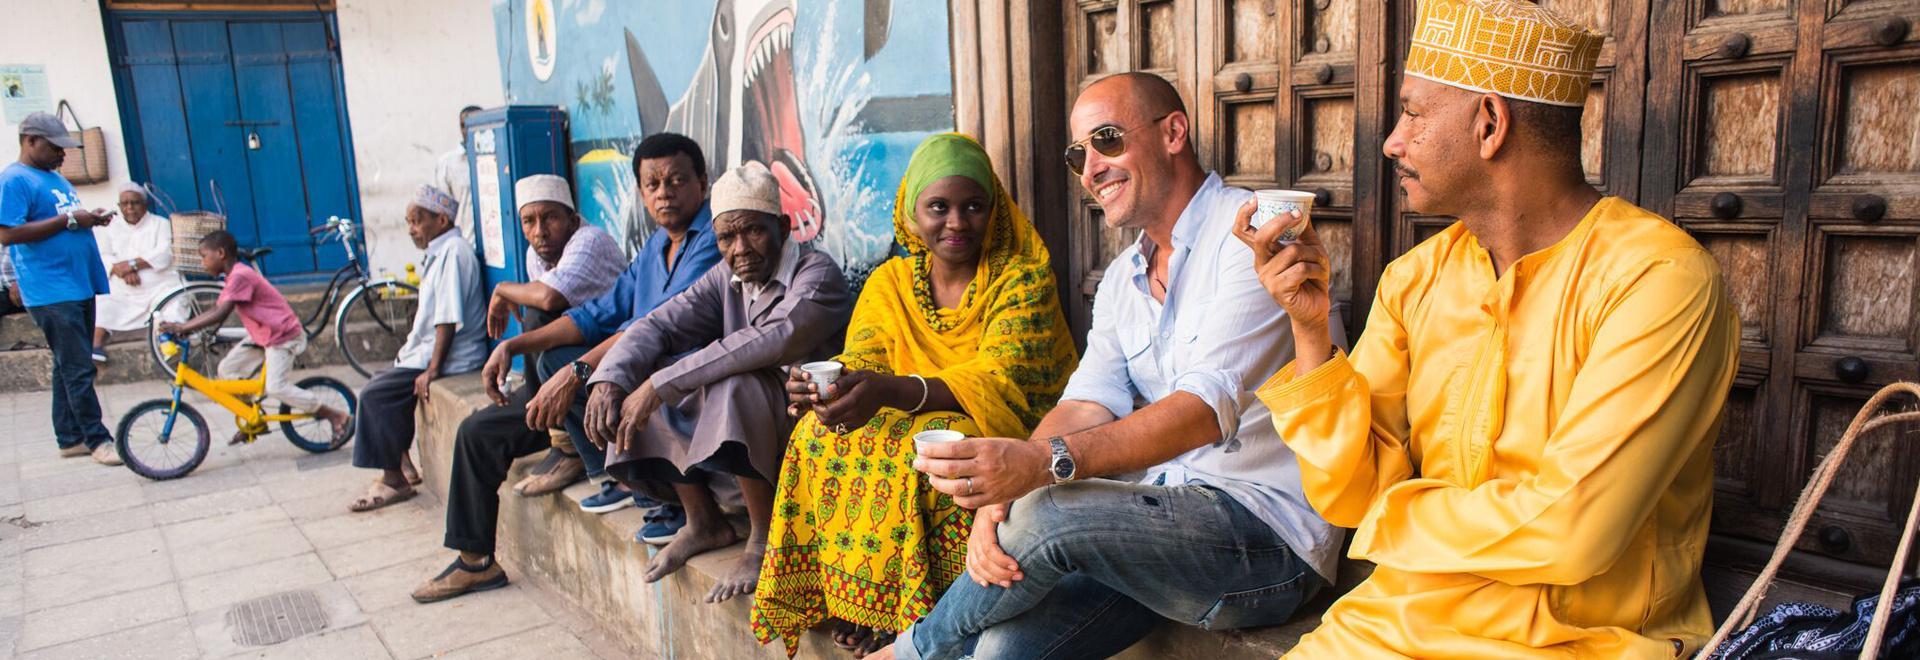 La 'Little Italy' africana